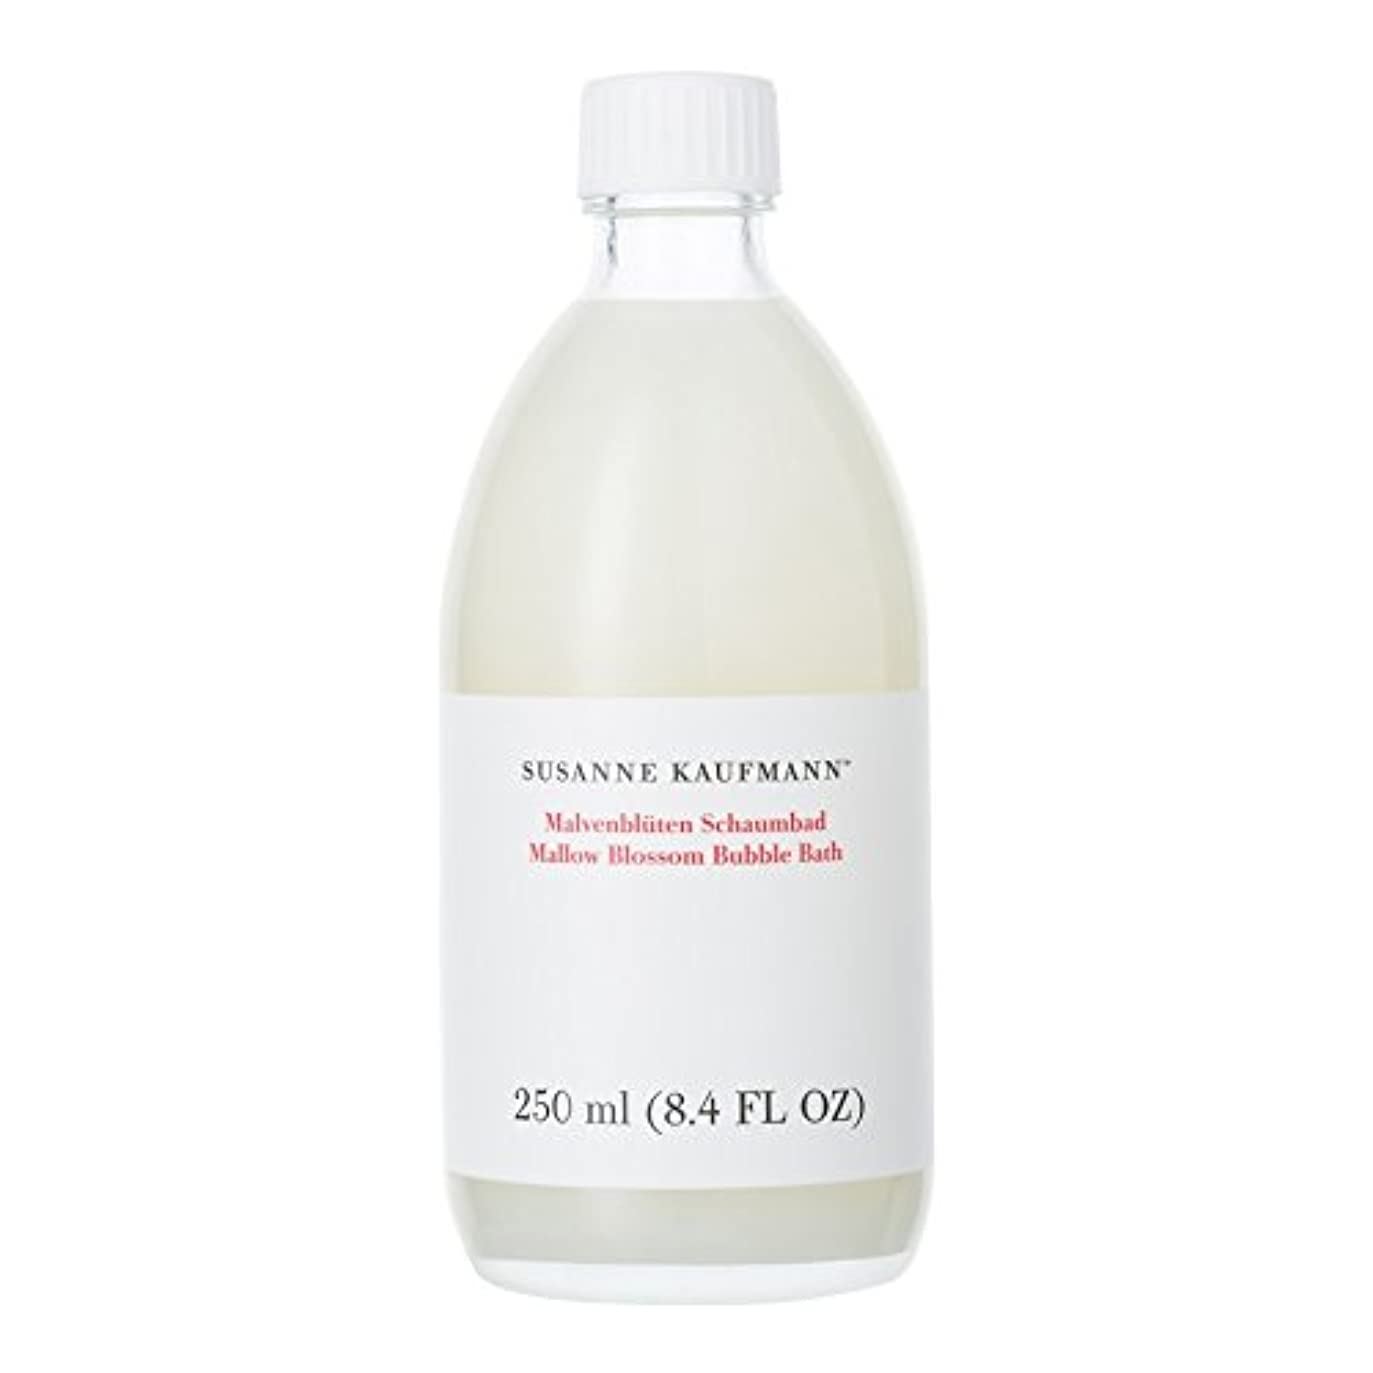 Susanne Kaufmann Mallow Blossom Bath 250ml - スザンヌカウフマンアオイ花バス250ミリリットル [並行輸入品]